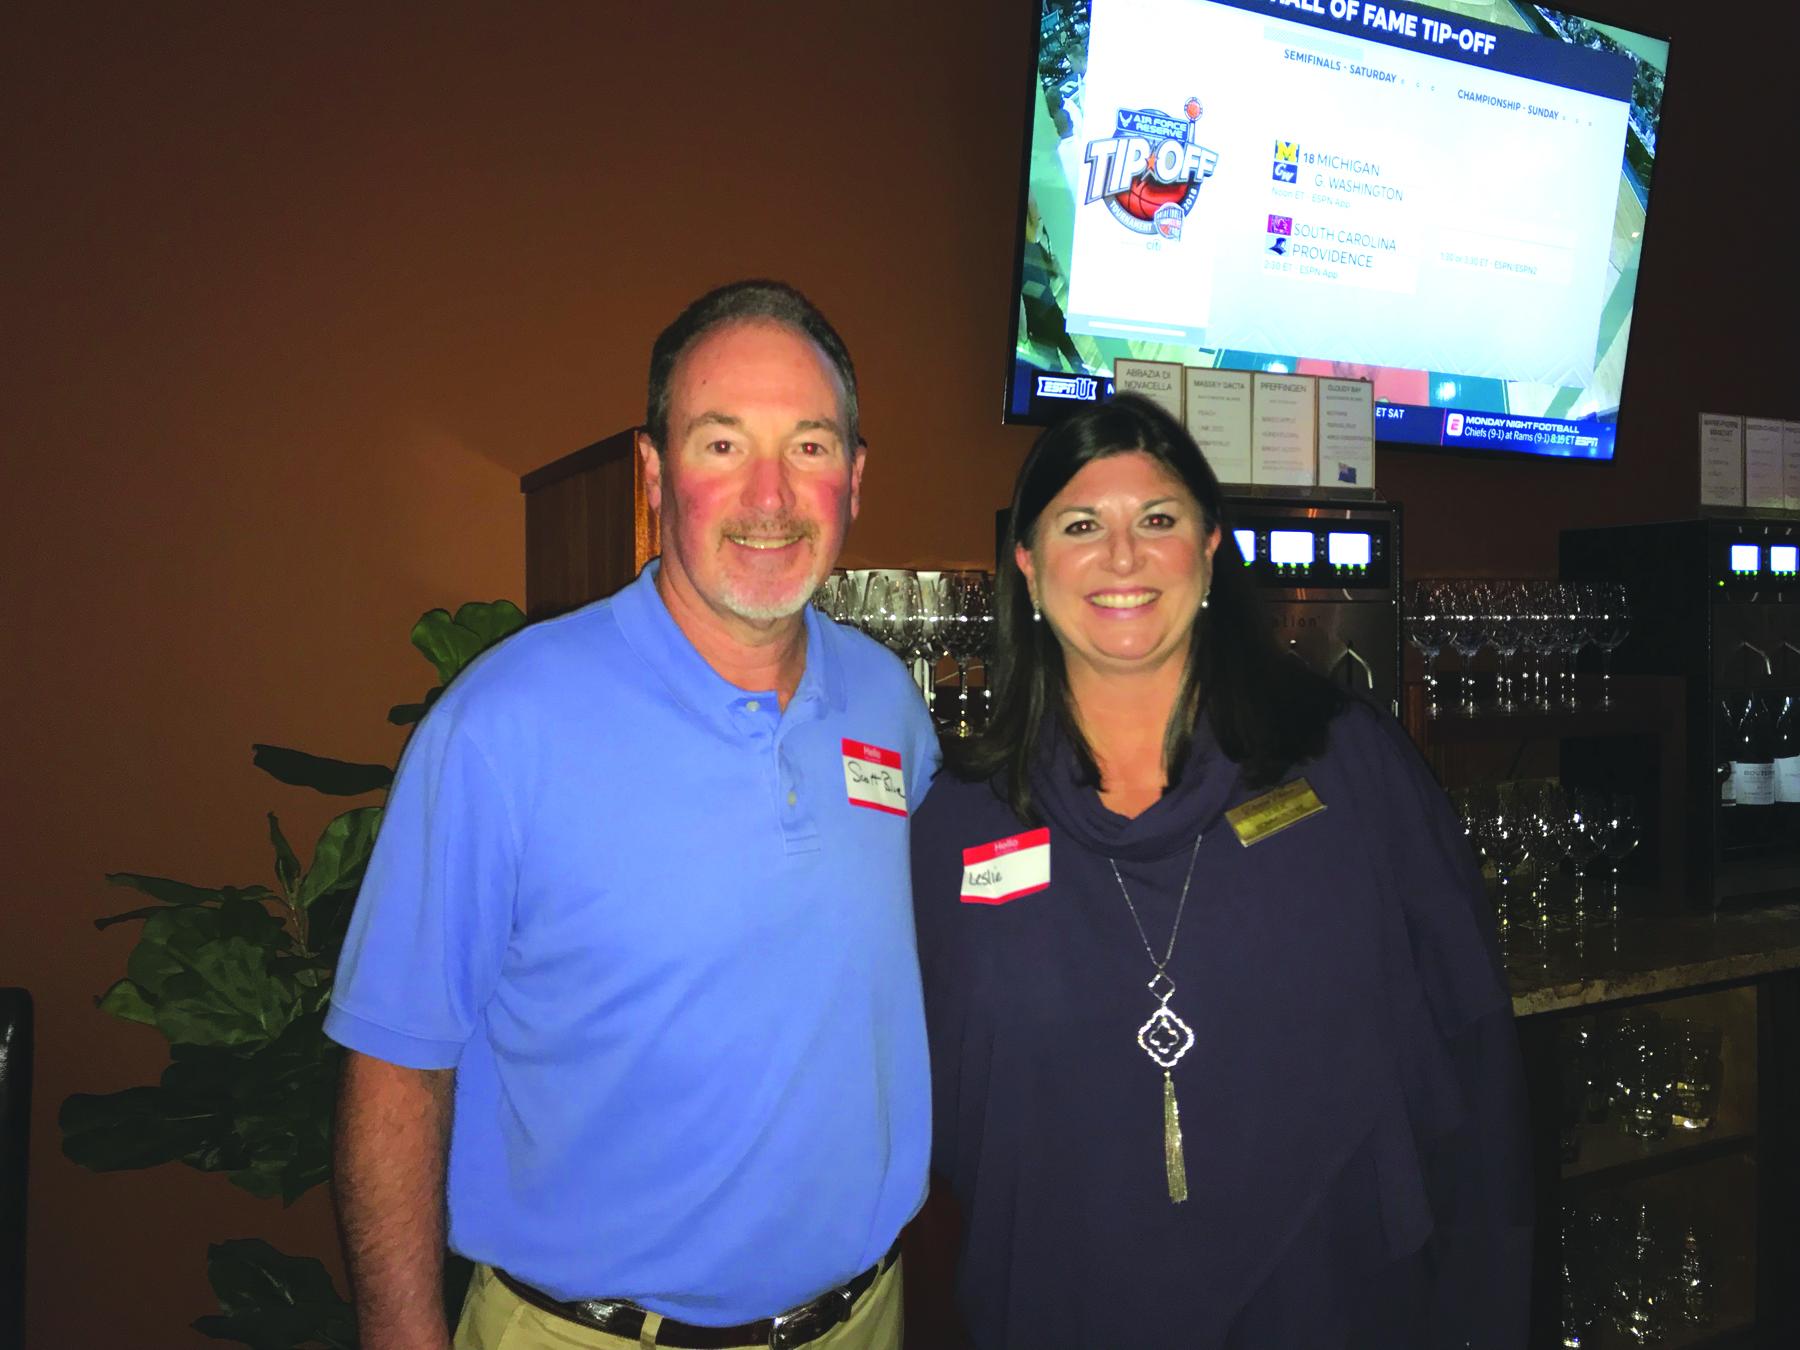 Scott Blue of Vail Travel/SC Federal and Leslie Sommerdyke of Daniel Pointe Resort.